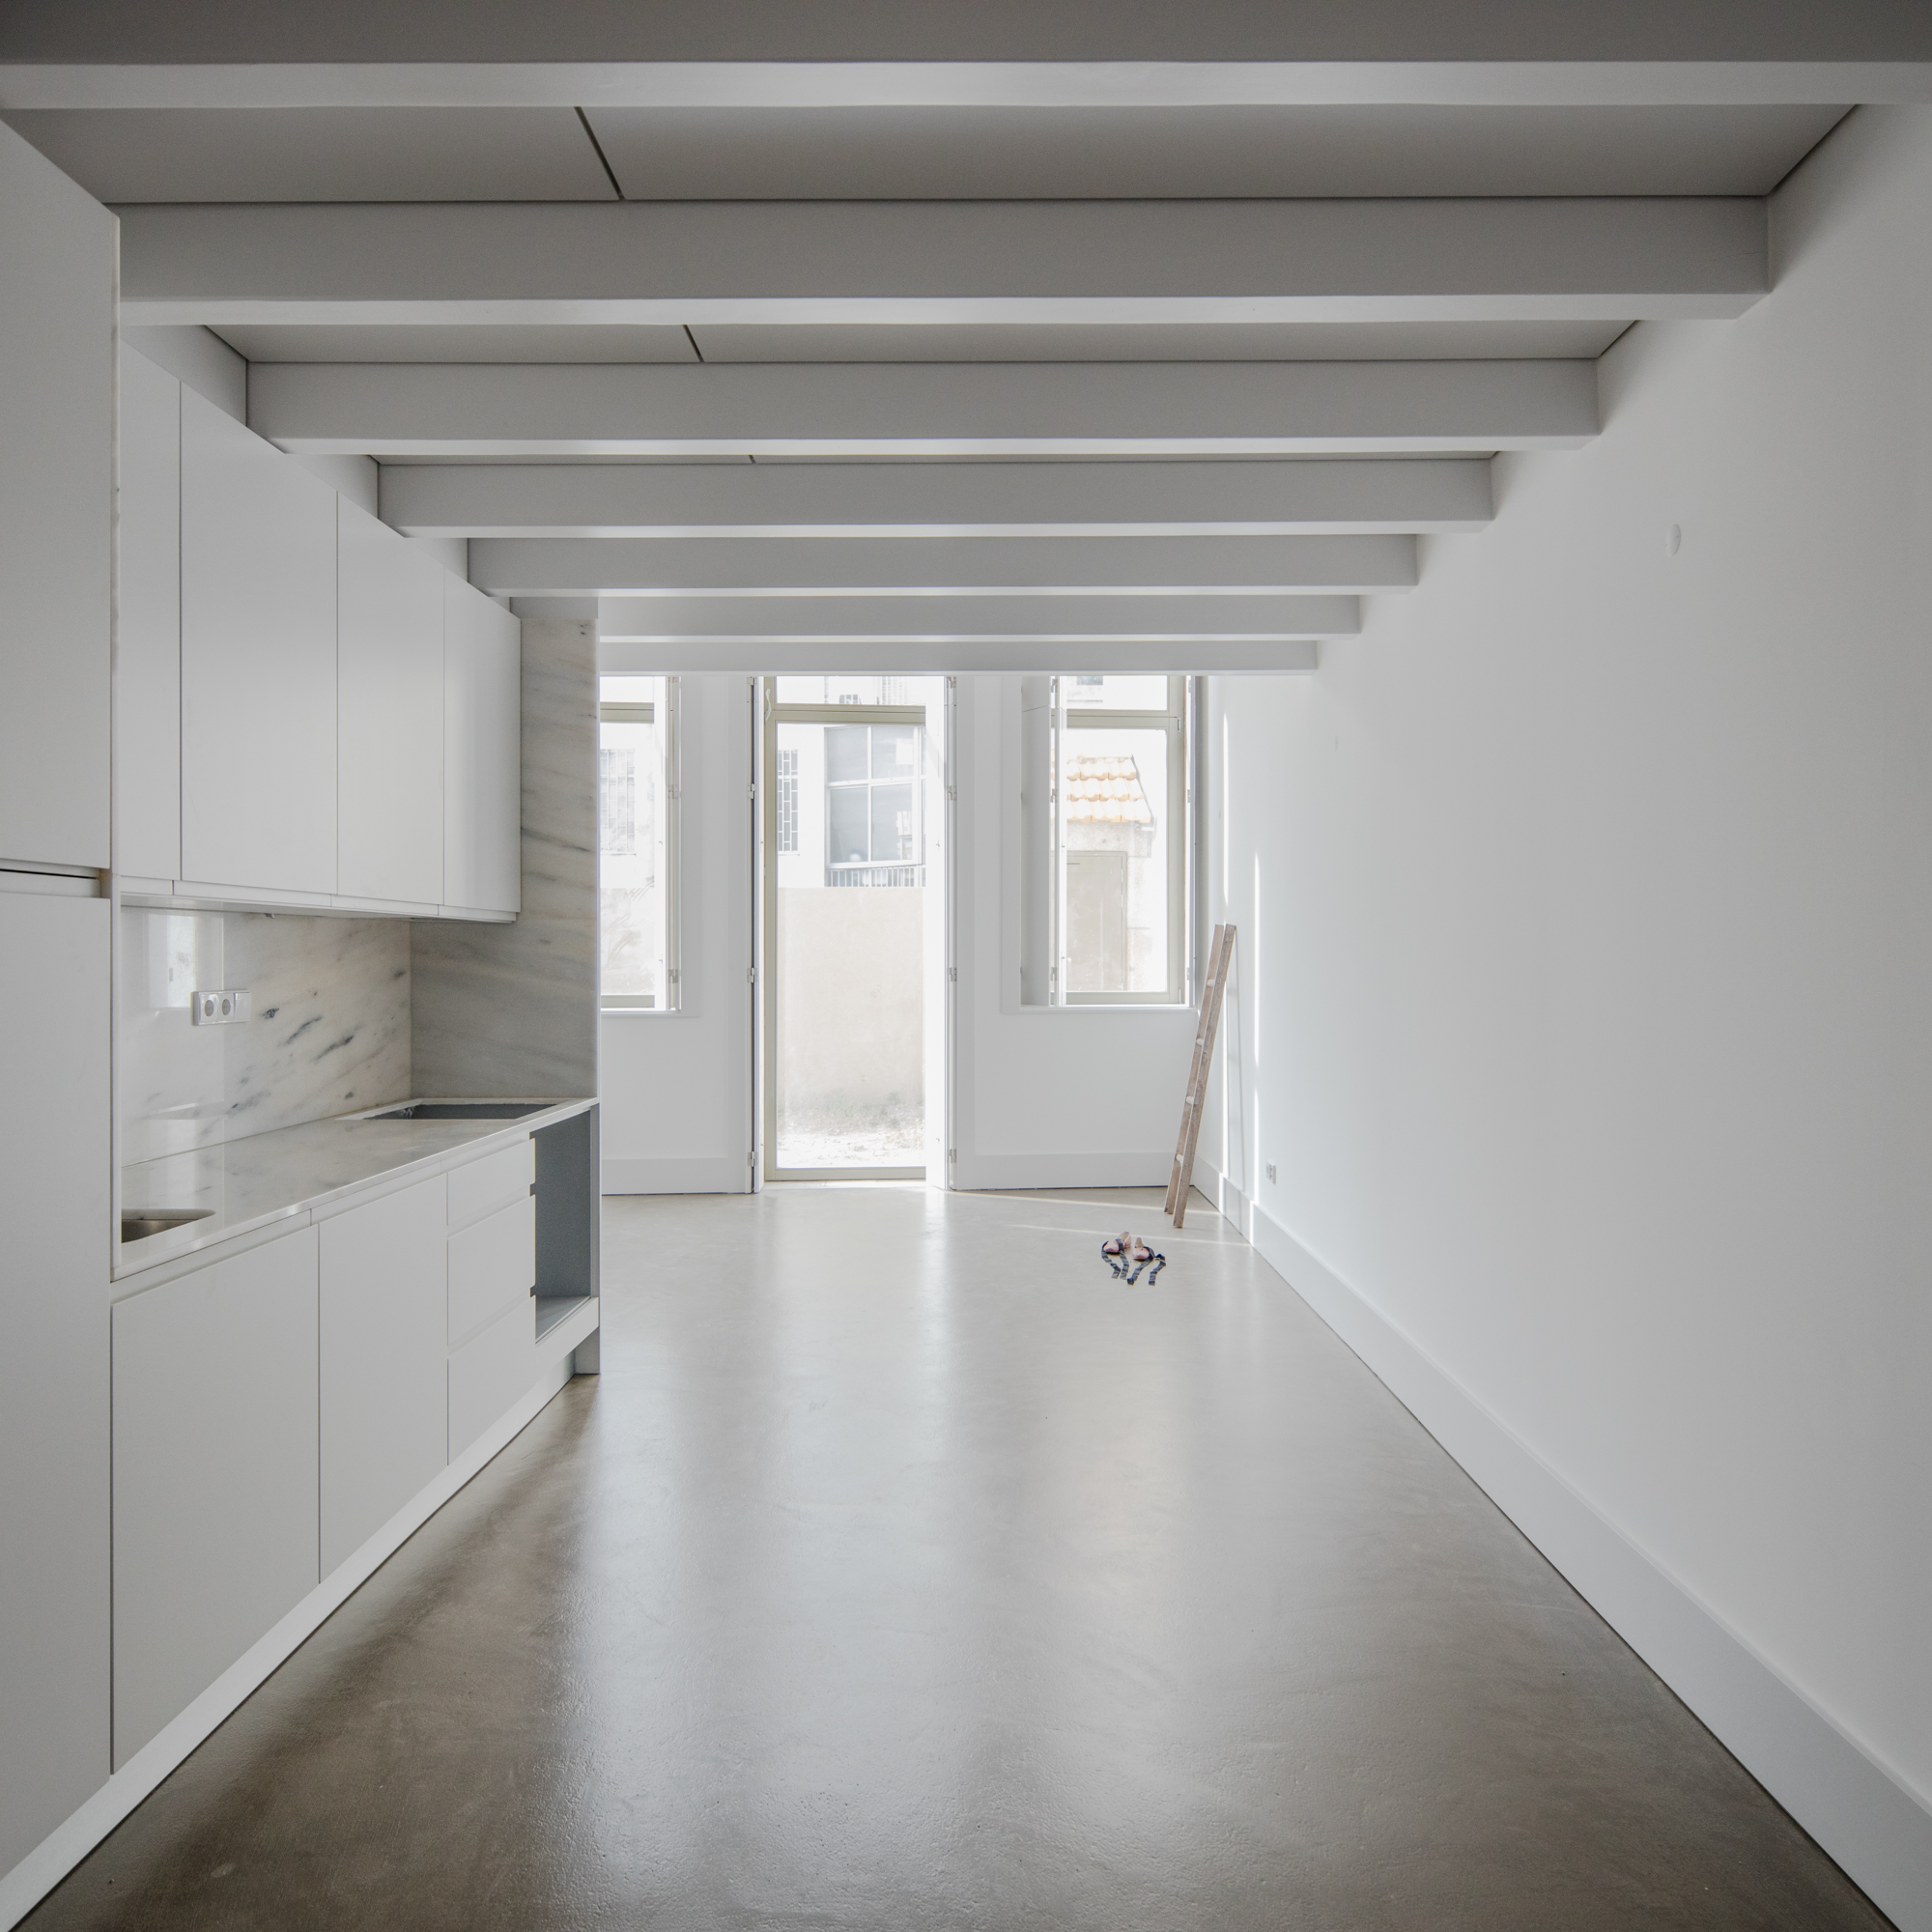 Alves da Veiga - Pedro Ferreira Architecture Studio